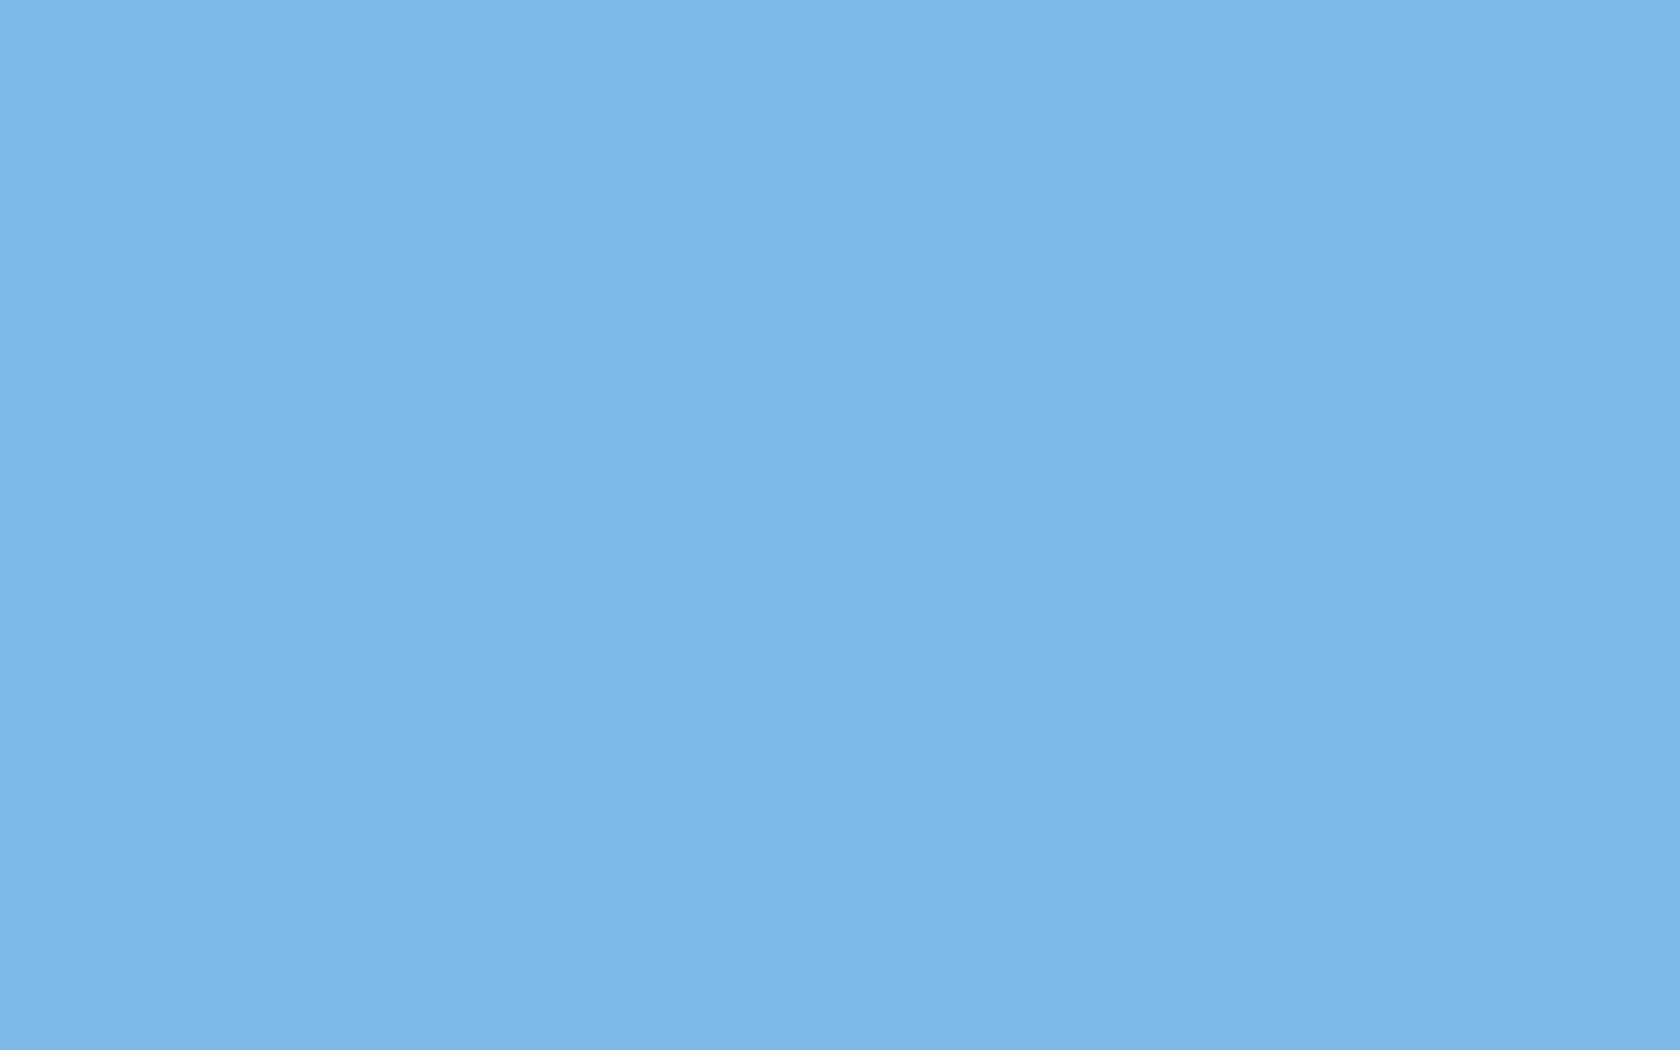 1680x1050 Aero Solid Color Background